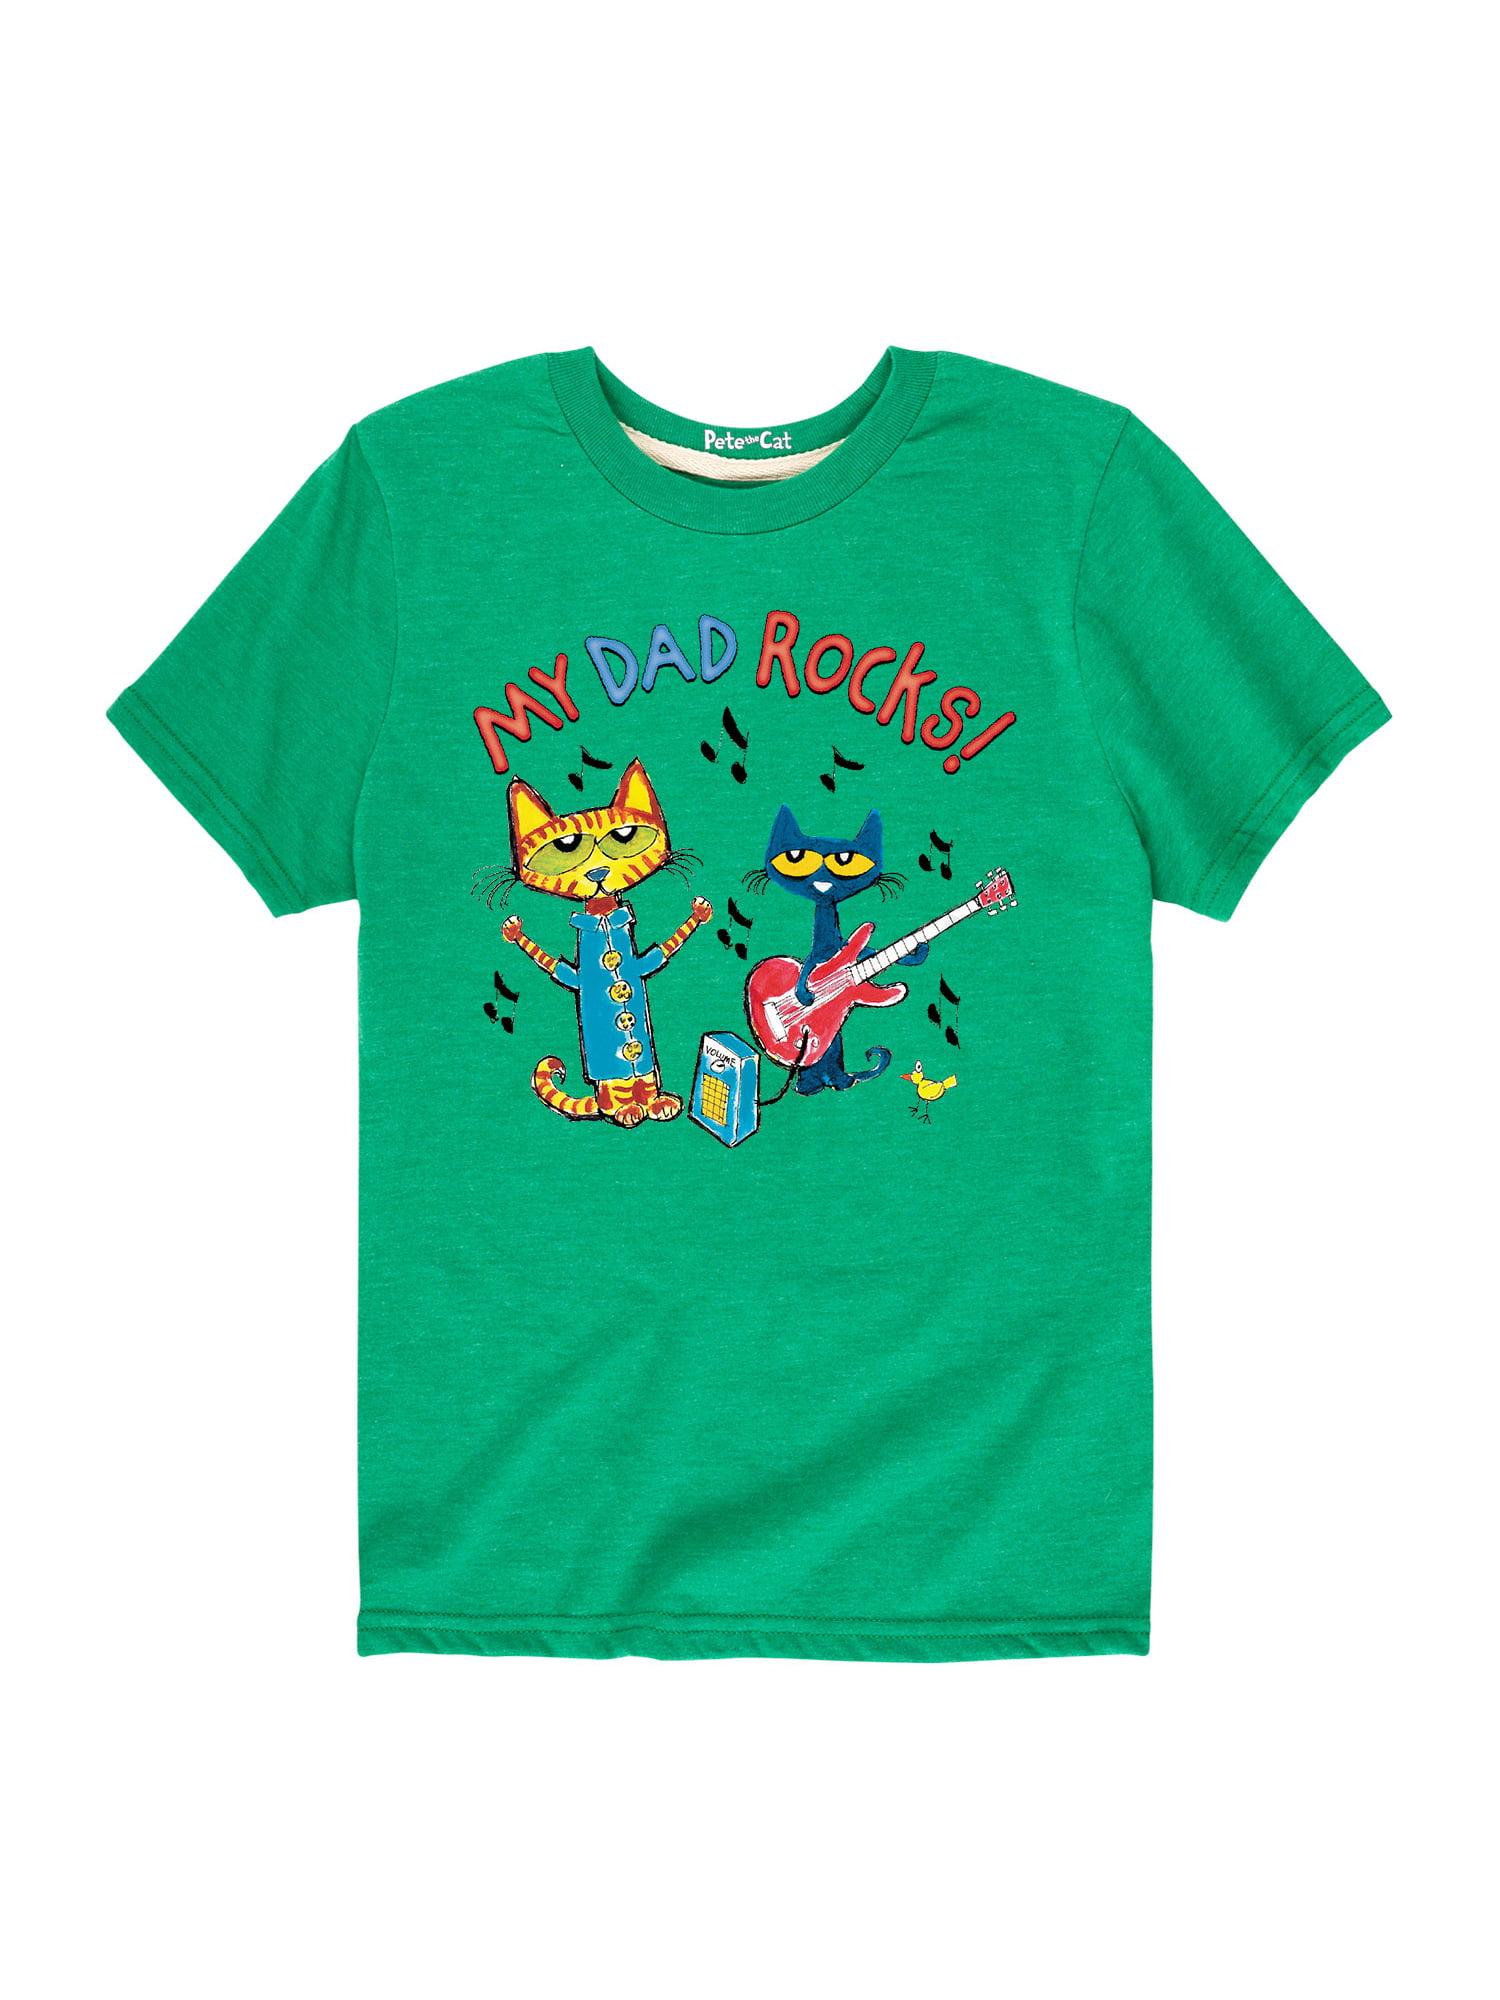 Pete The Cat My Dad Rocks - Toddler Short Sleeve Tee